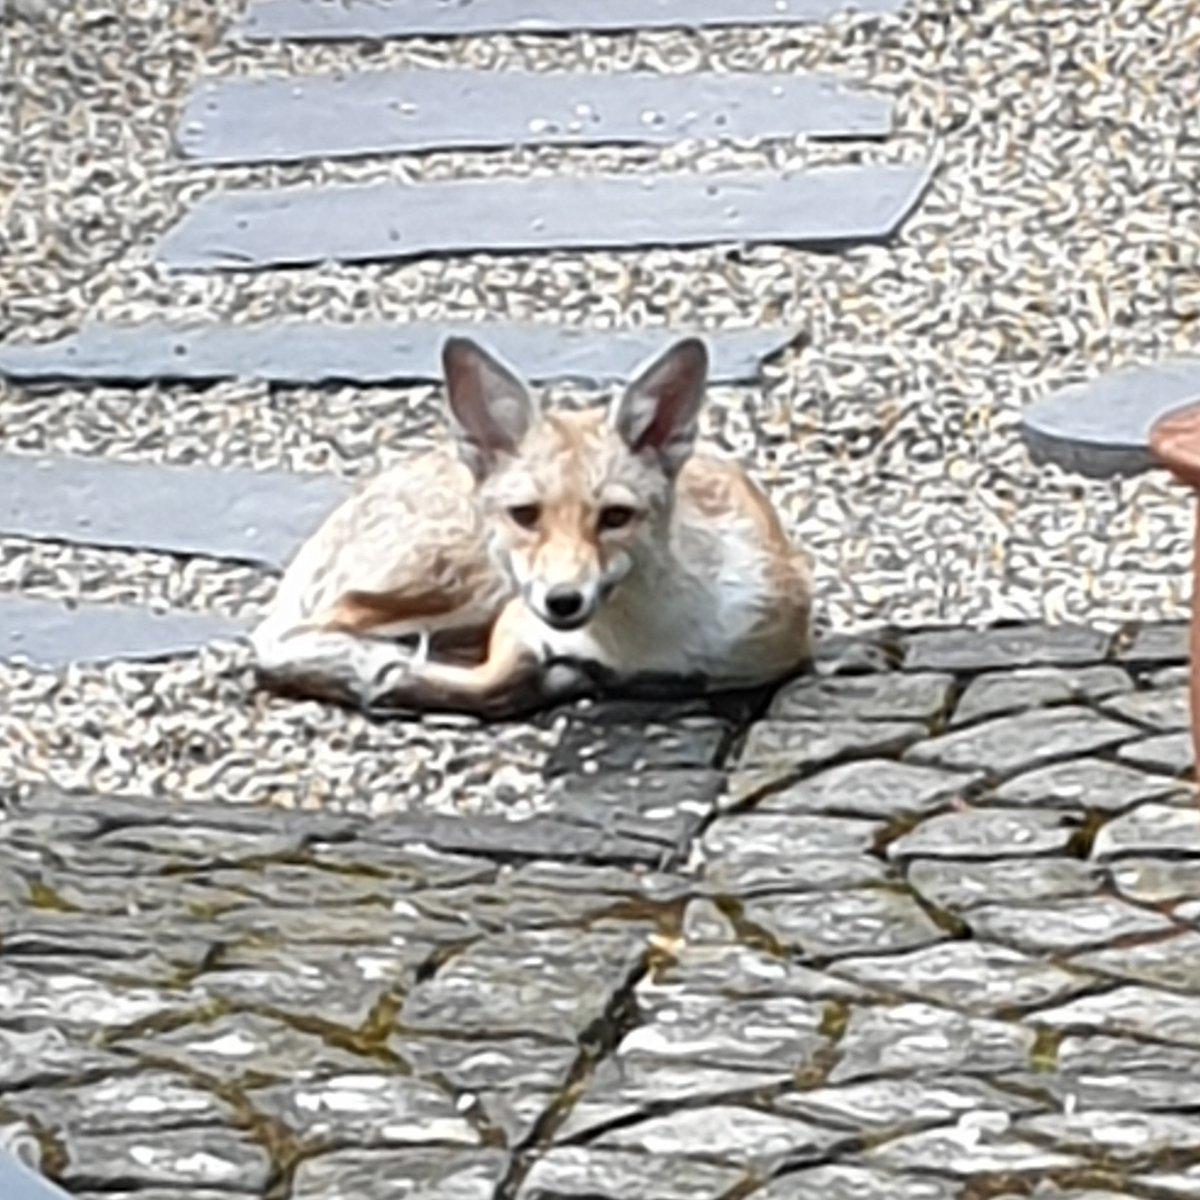 Good morning, Reynard! #foxnews #urbanfox #fox #lazysaturday #nature #Wimbledon #garden #smile @mirabarhillel